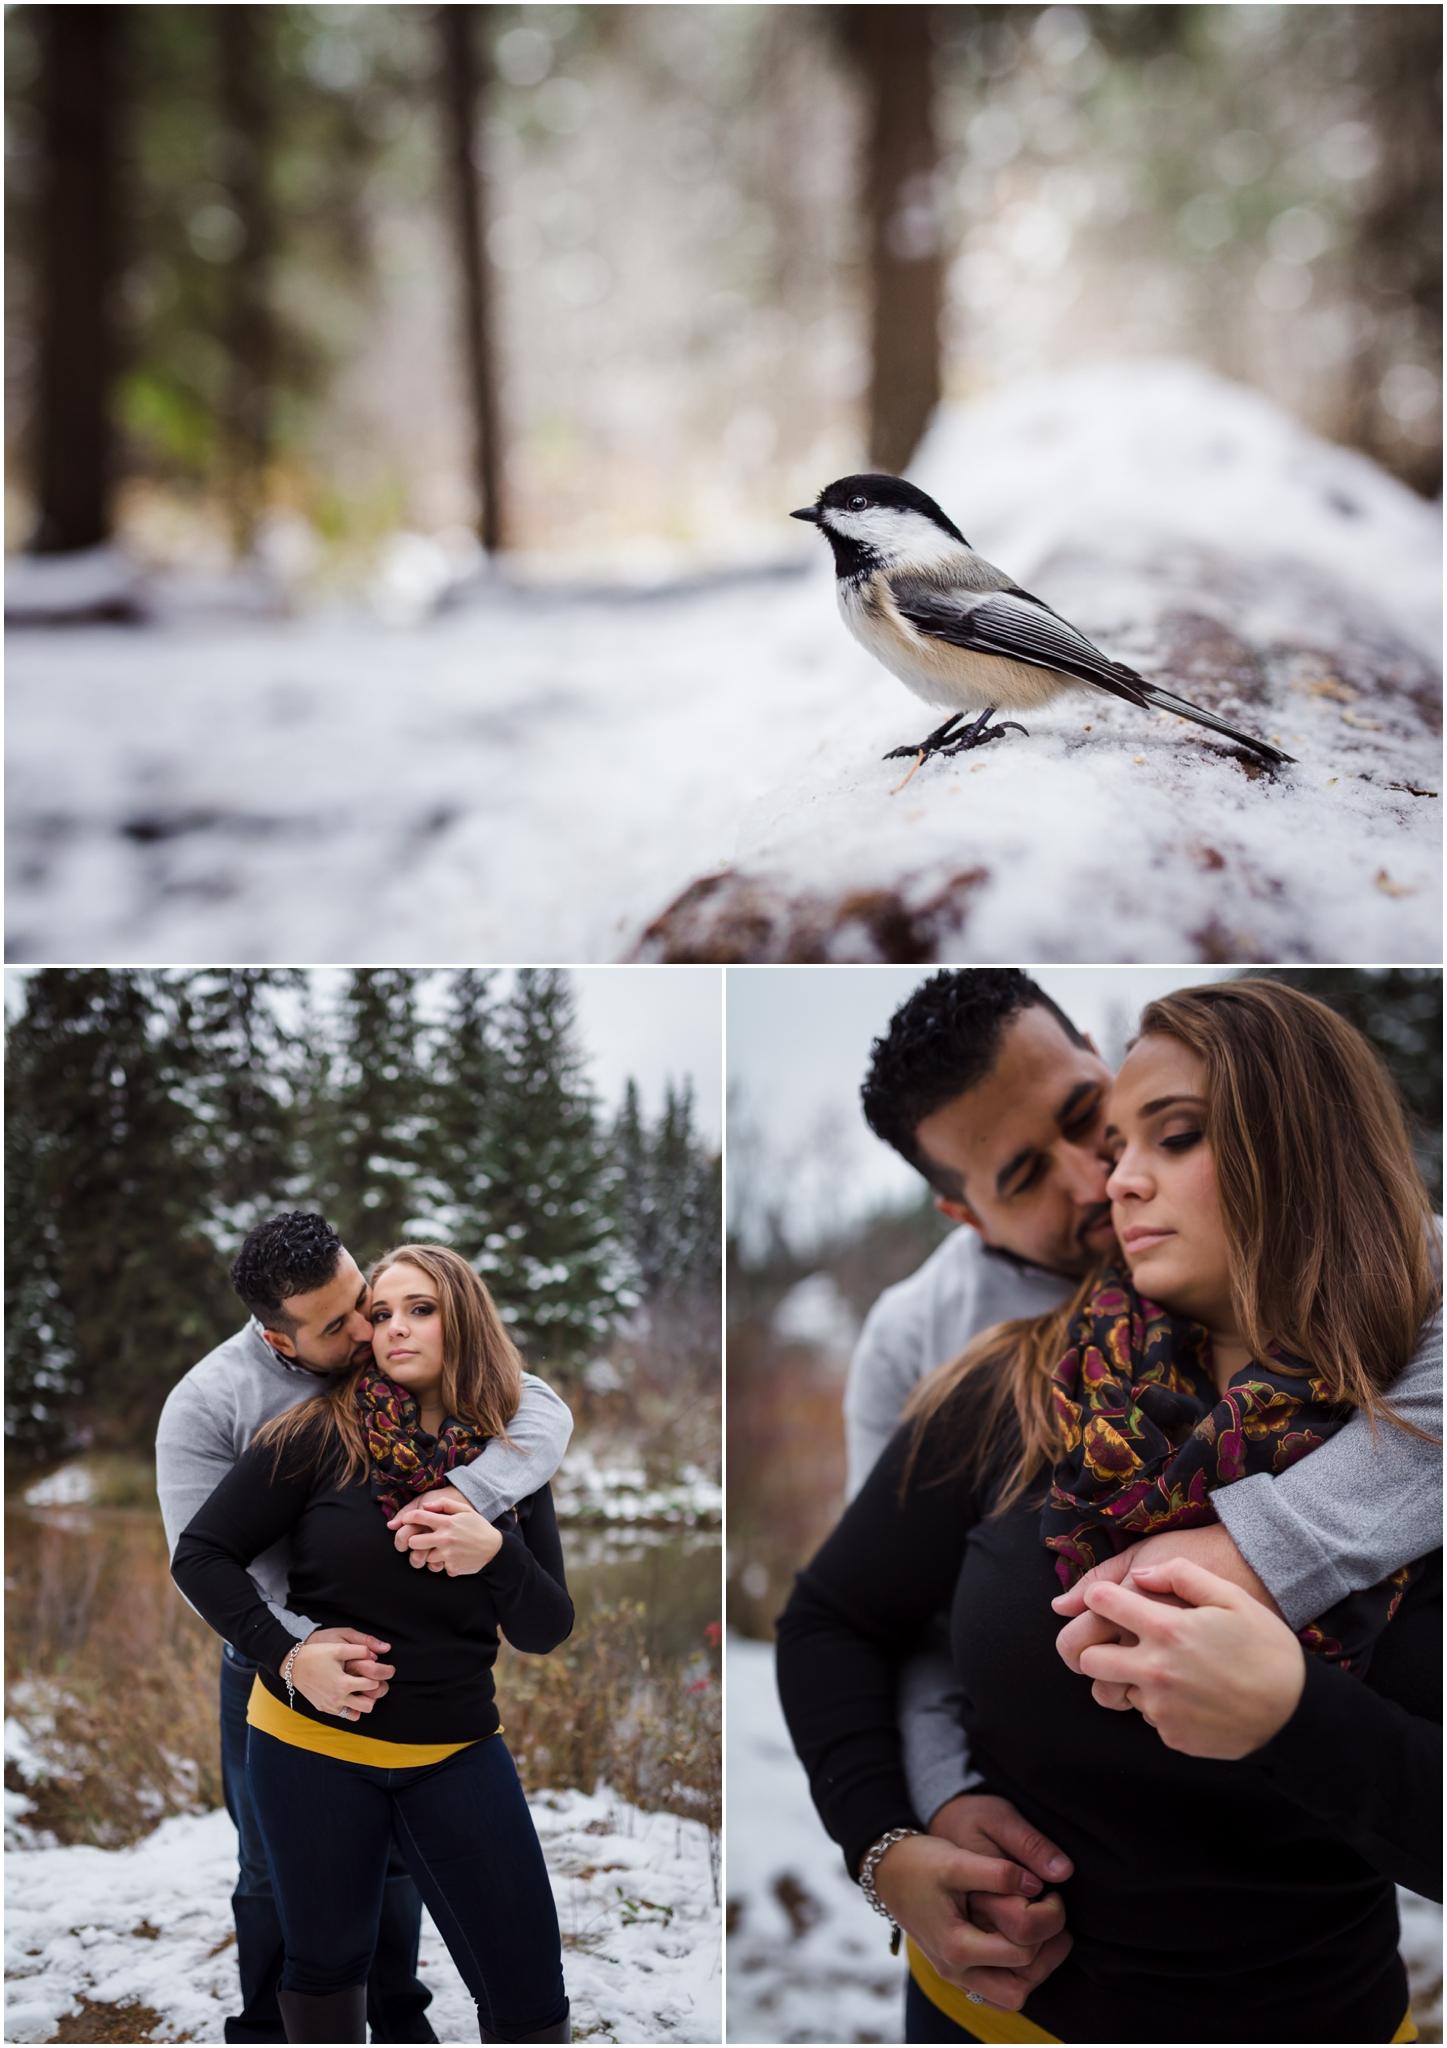 Edmonton couples photographer couples in love best of 2016 October